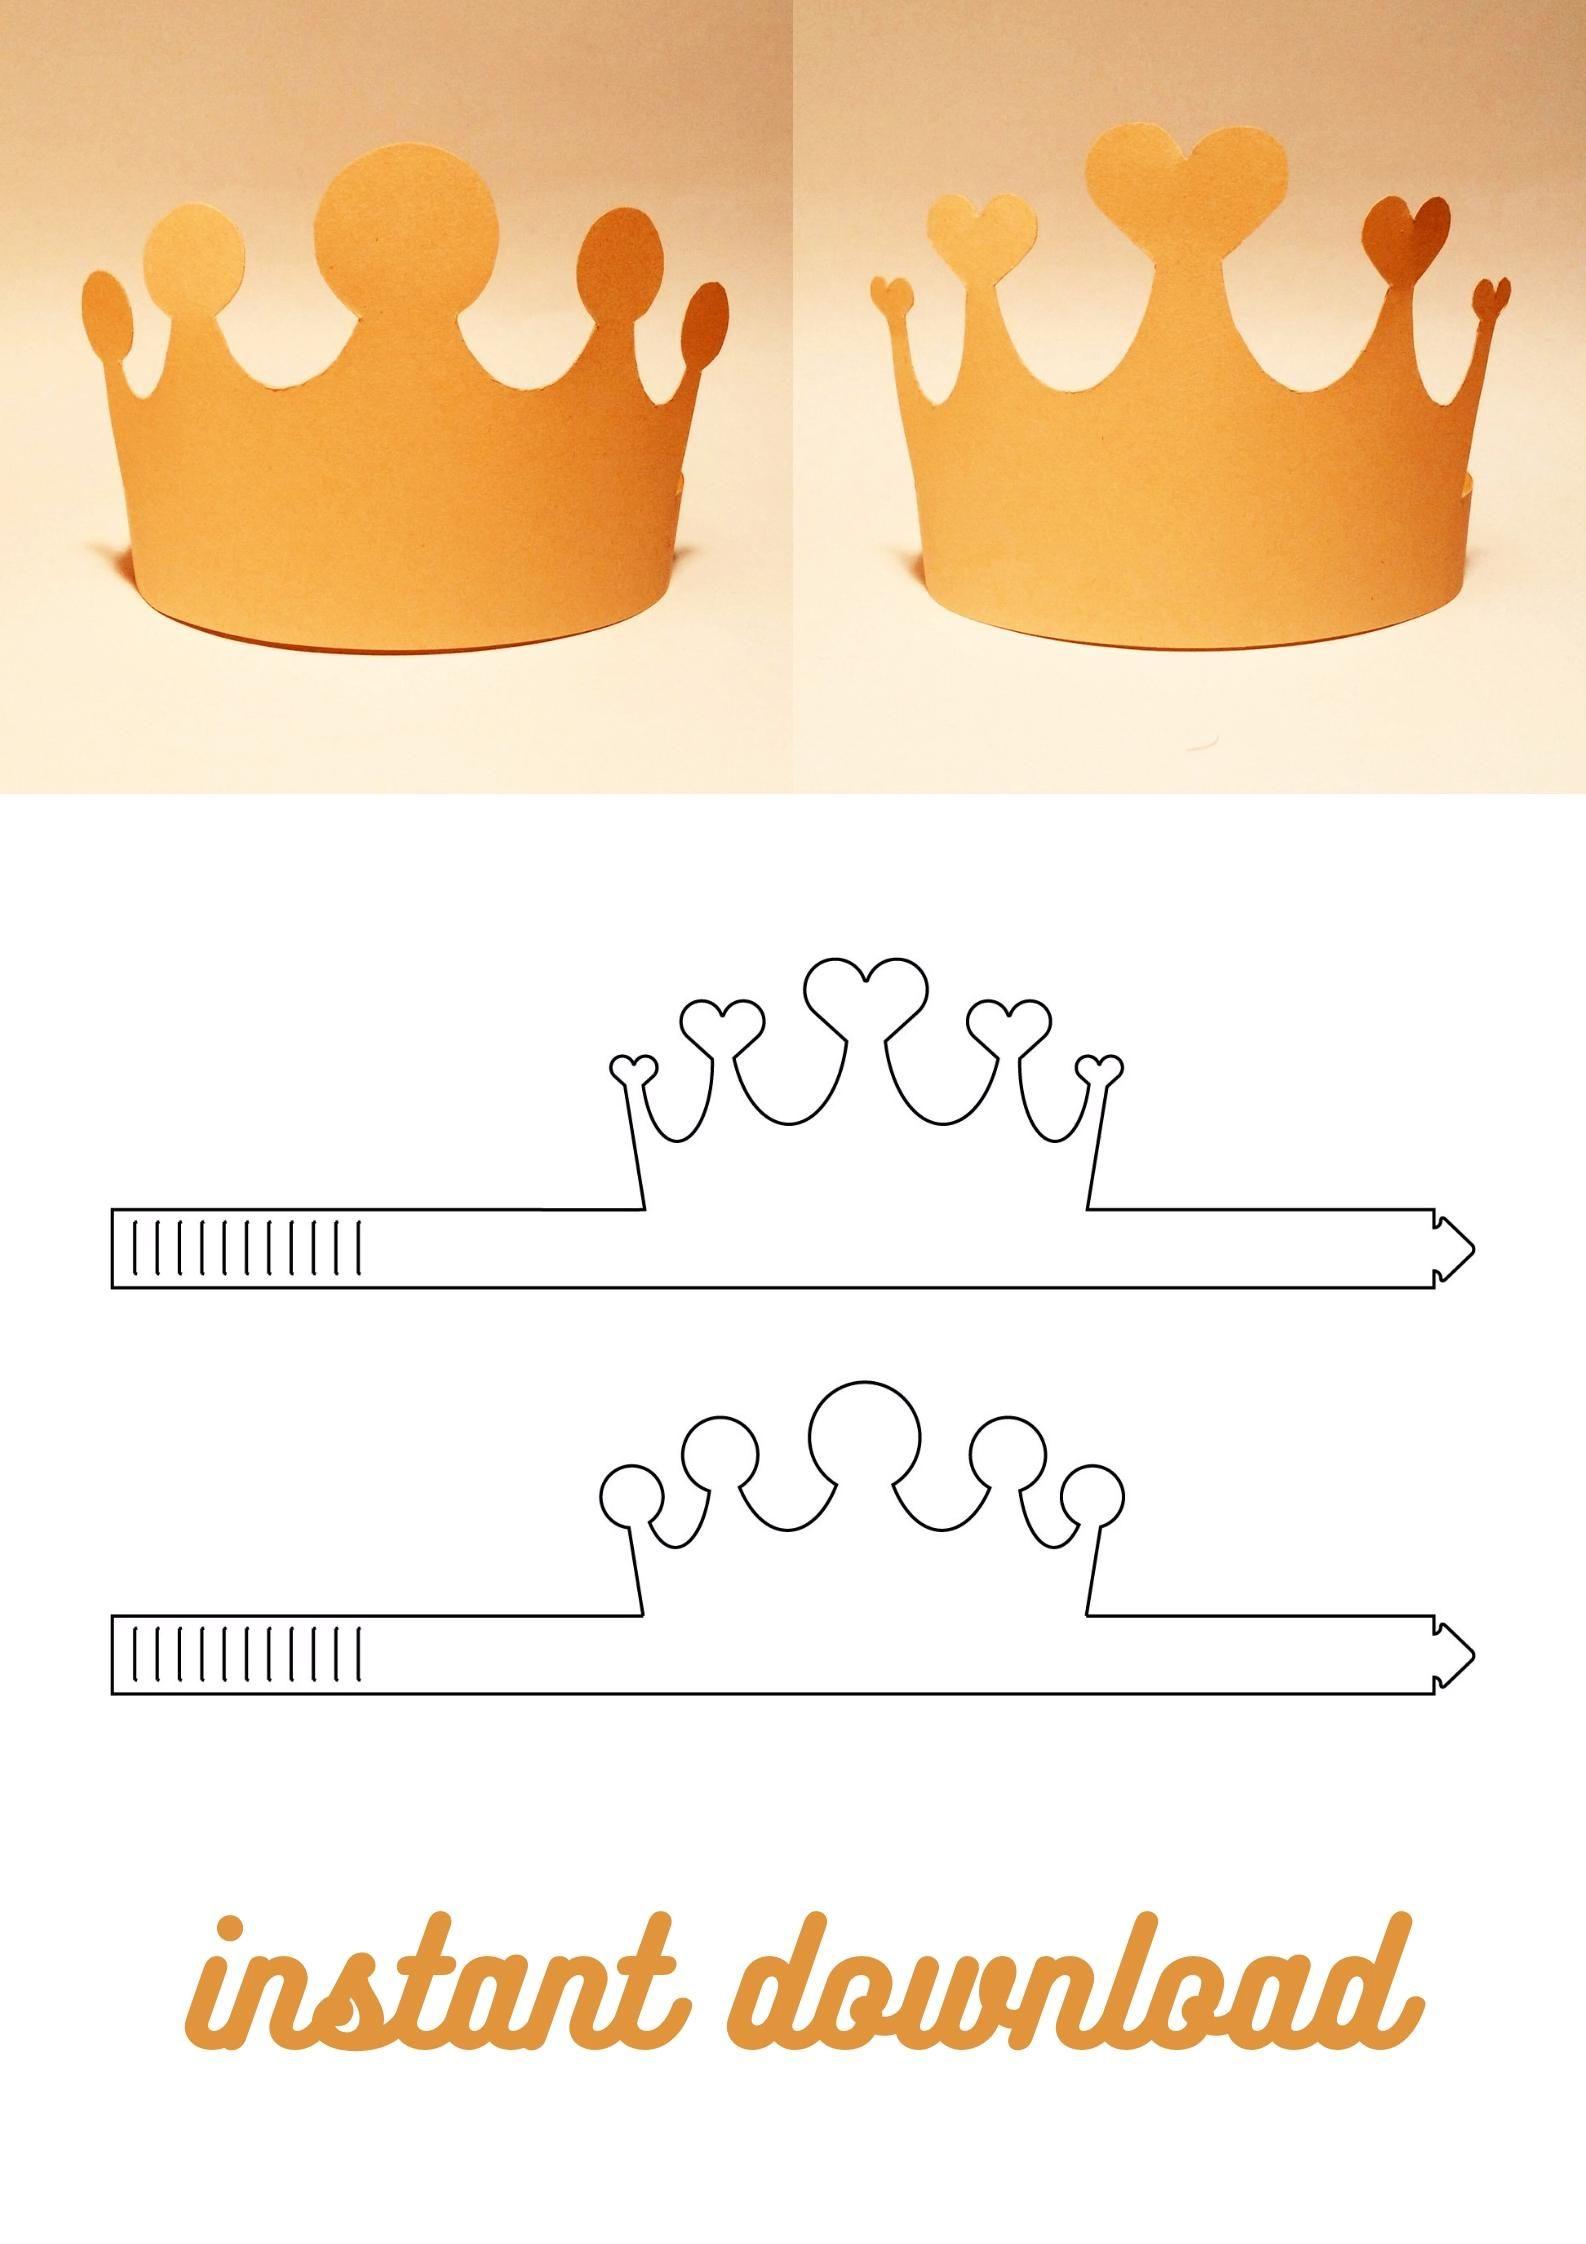 Paper Crown Template Party Crown Printable Crown Birthday Crown Svg Dxf Pdf Cricut Silhouette 8 5x11 A4 A3 Video Video In 2021 Paper Crowns Crown Template Birthday Crown